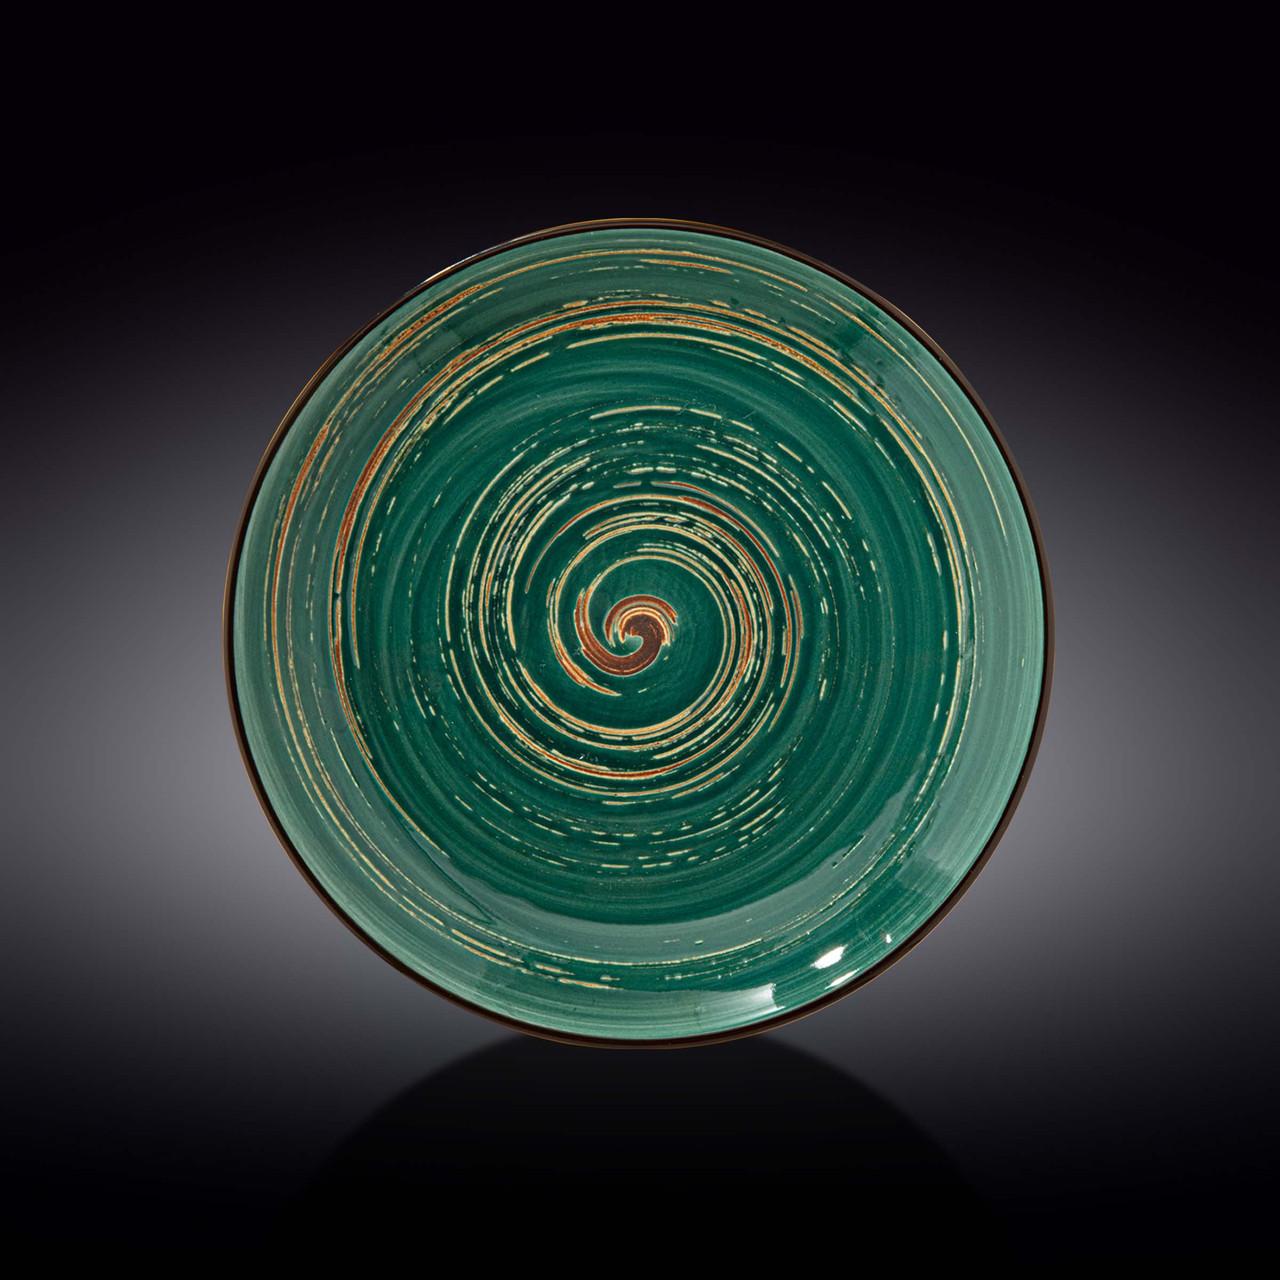 Тарелка обеденная Wilmax Spiral 28 см